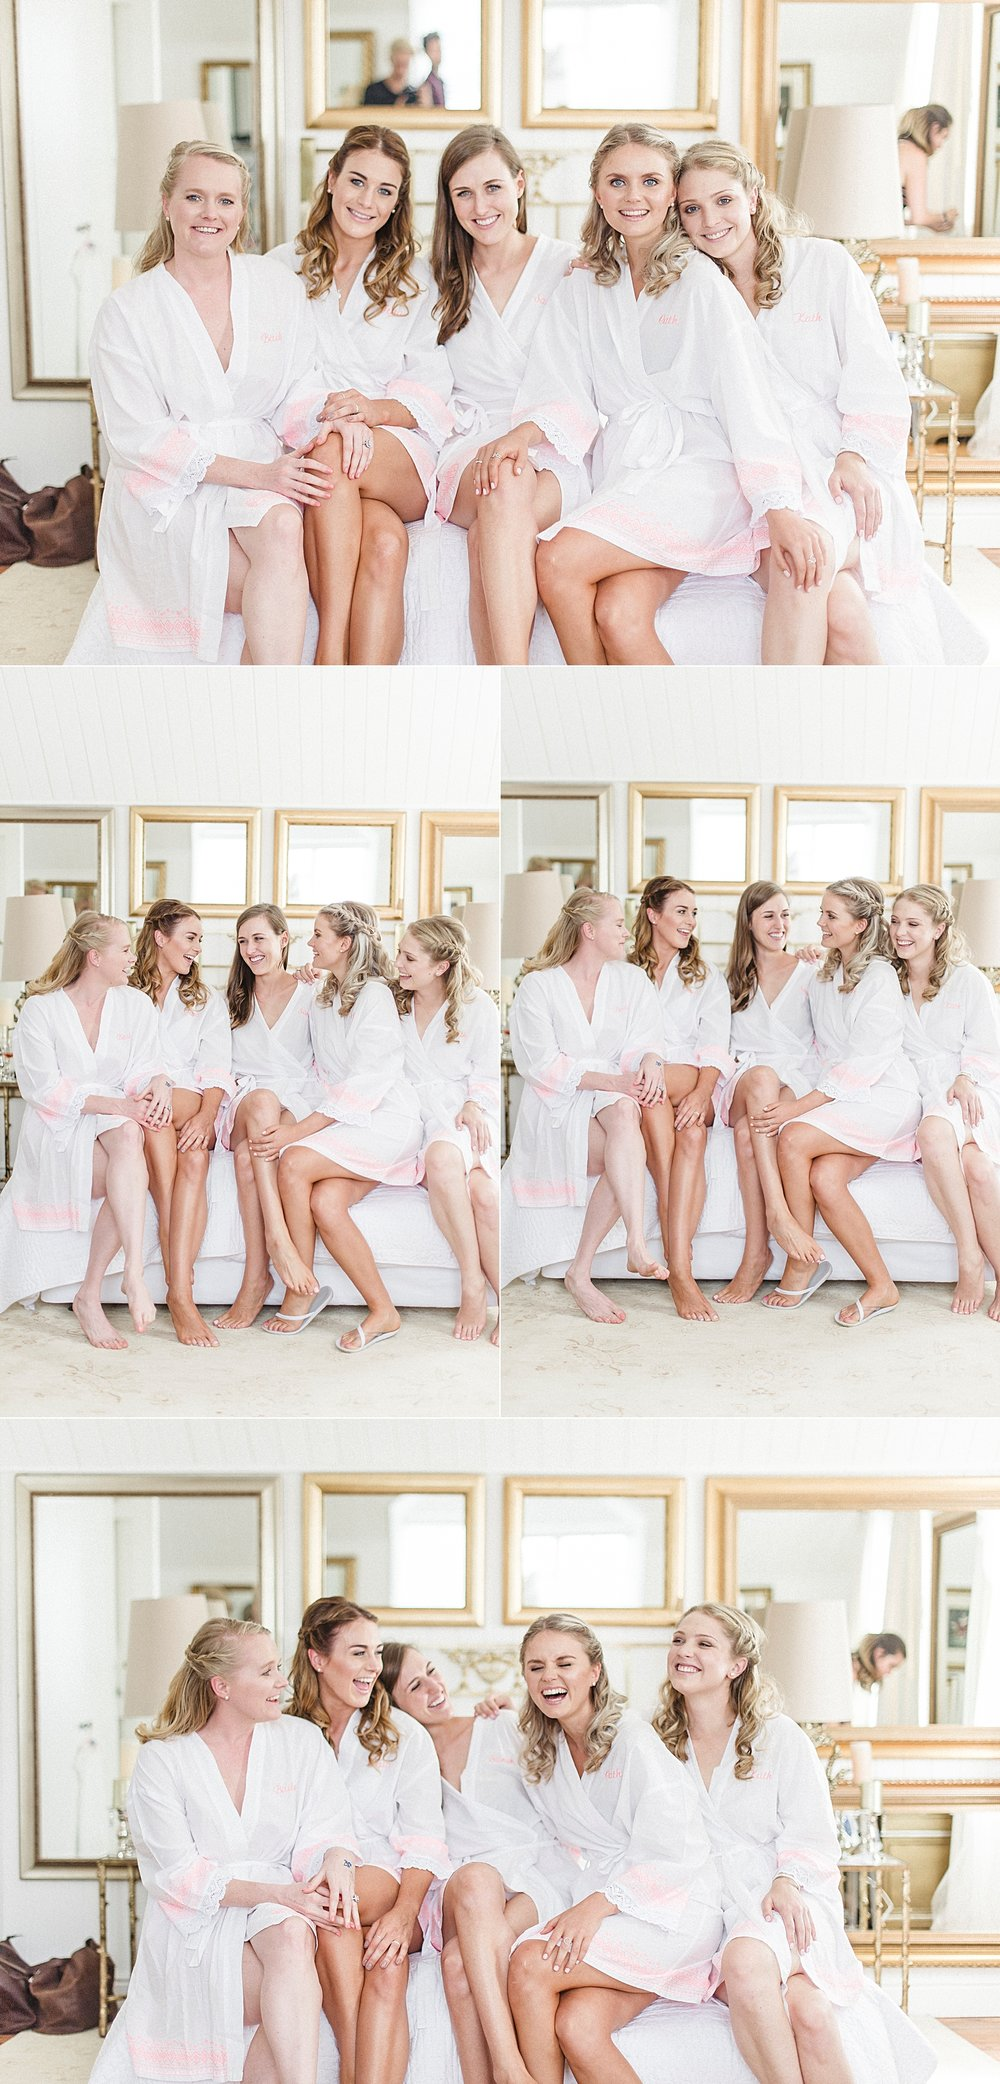 RyanParker_WeddingPhotographer_CapeTown_BonaDea_Hermanus_S&A_DSC_1147 2.jpg